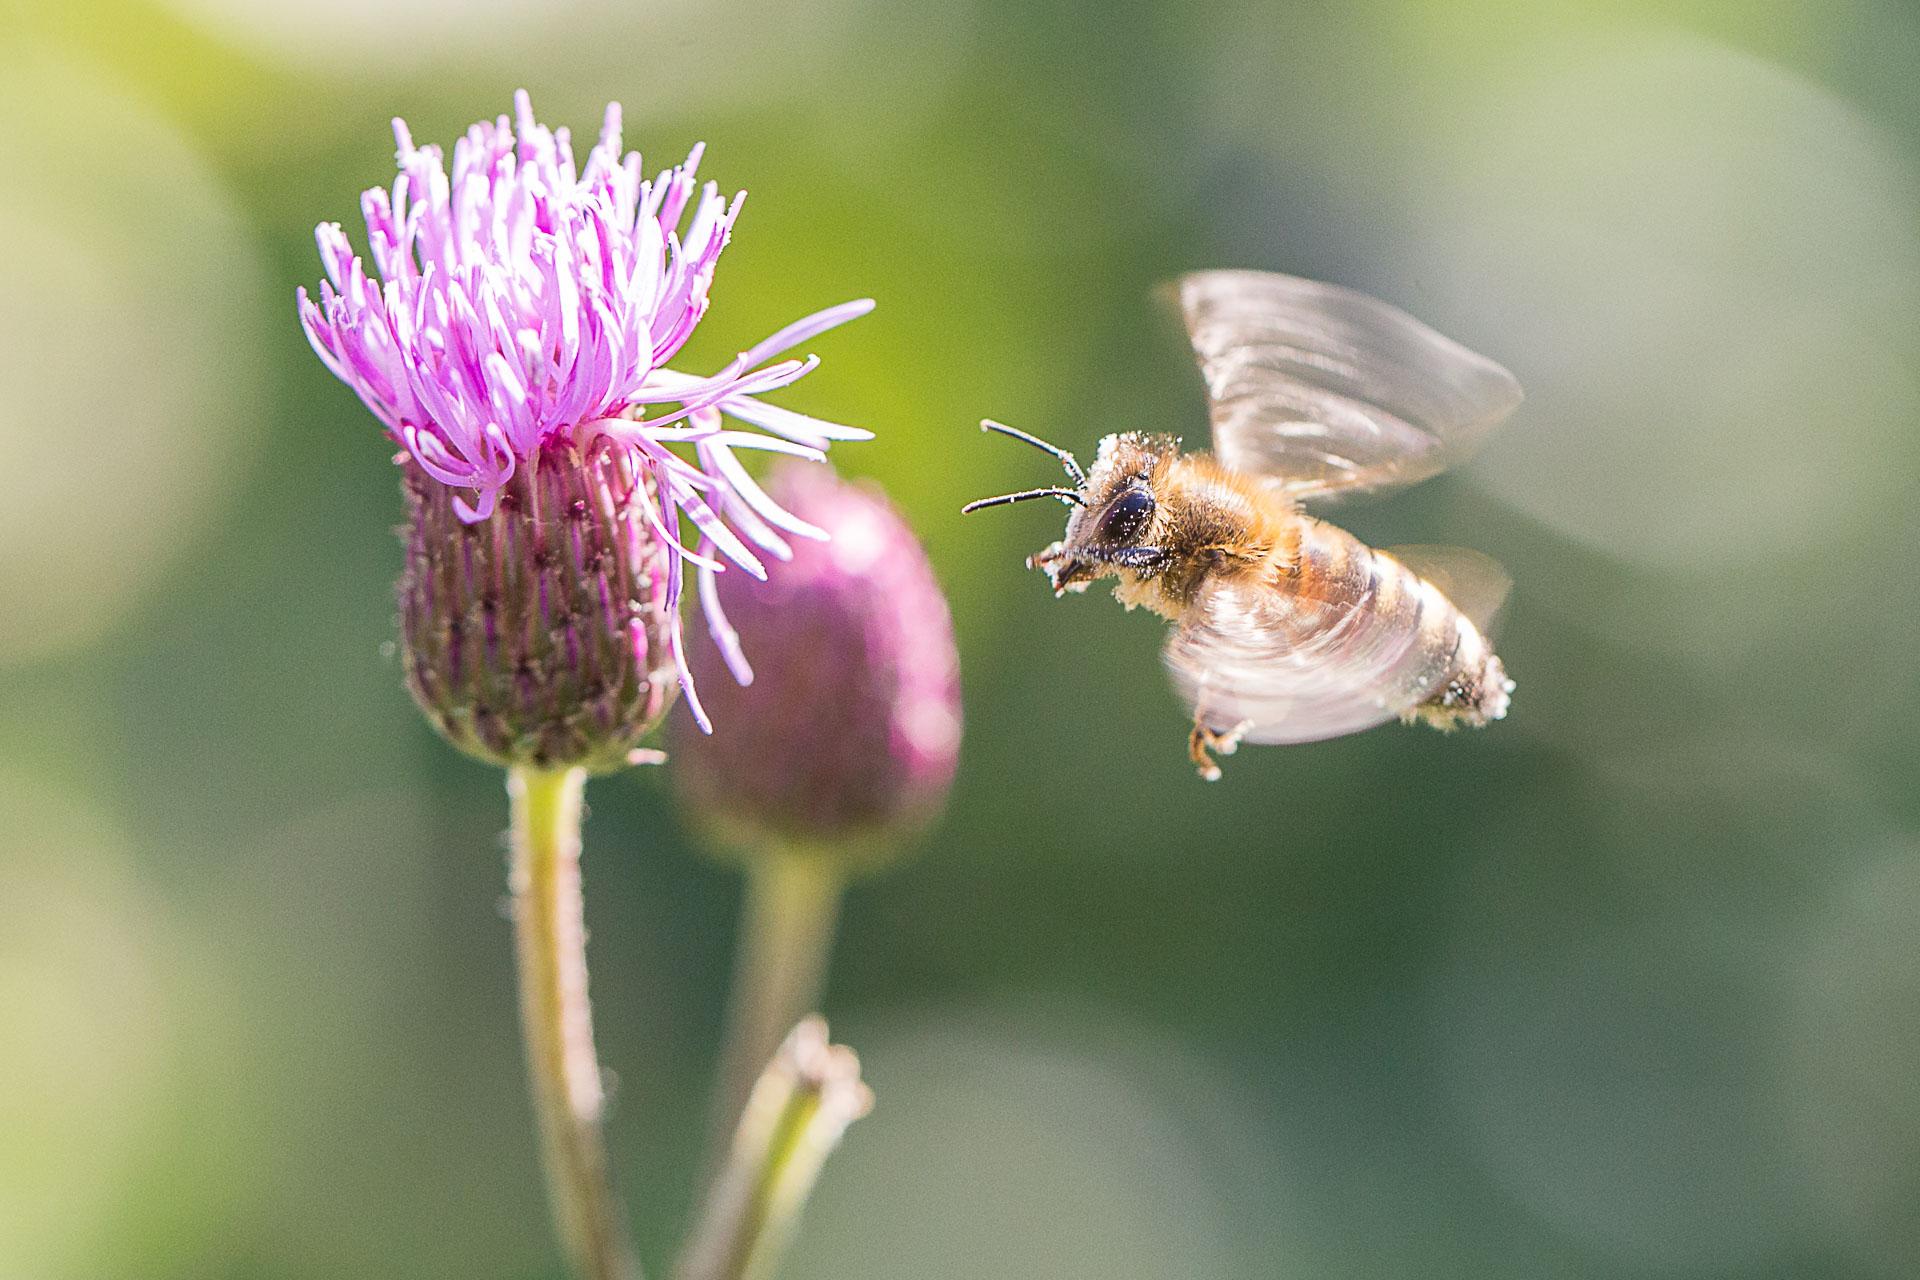 abeille-en-vol